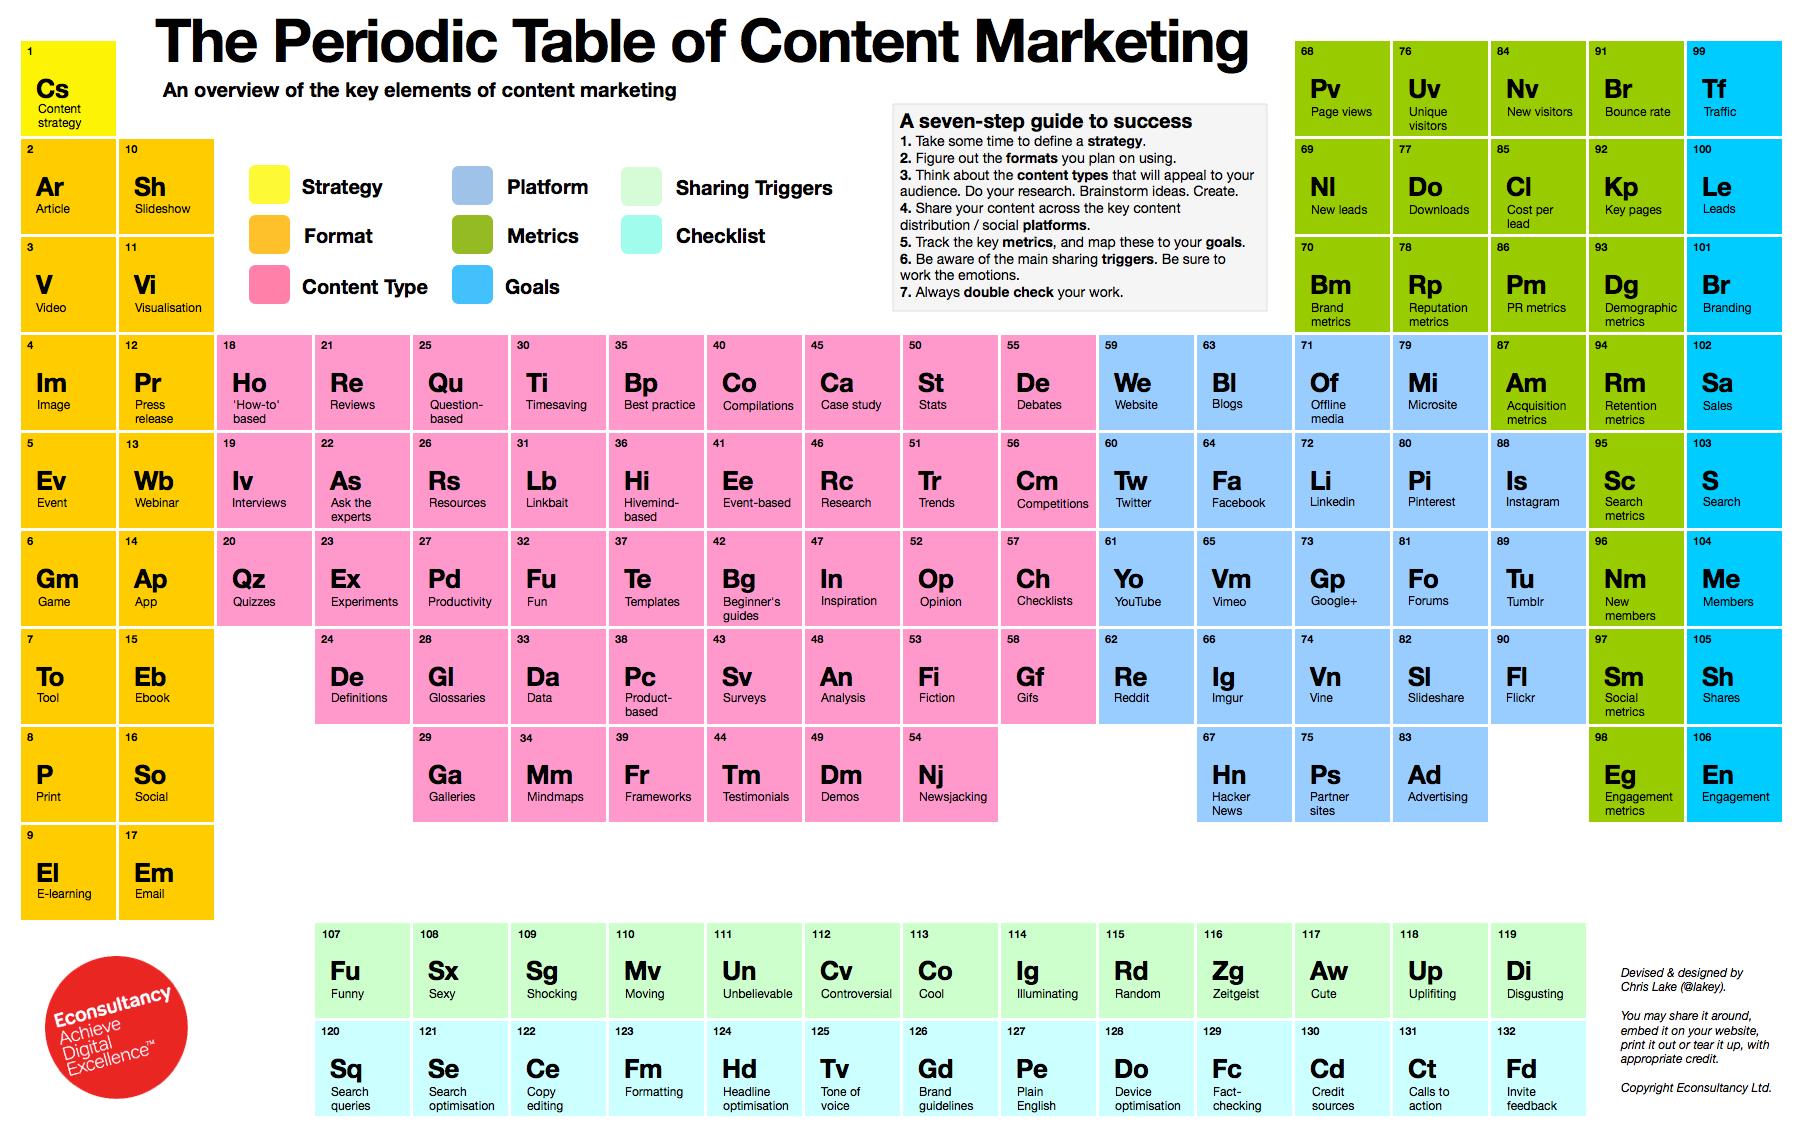 Tabla periódica del Marketing de Contenido